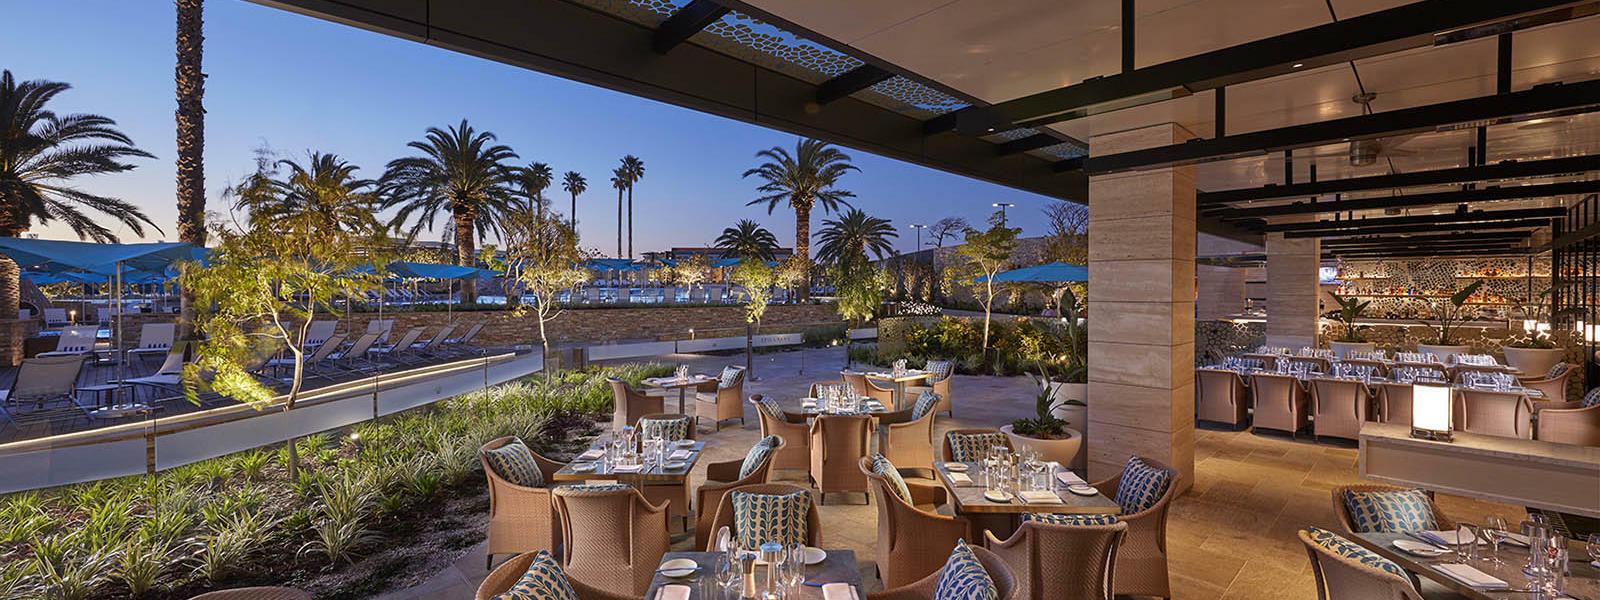 Epicurean Meeting Room facilities at Crown Hotel Perth